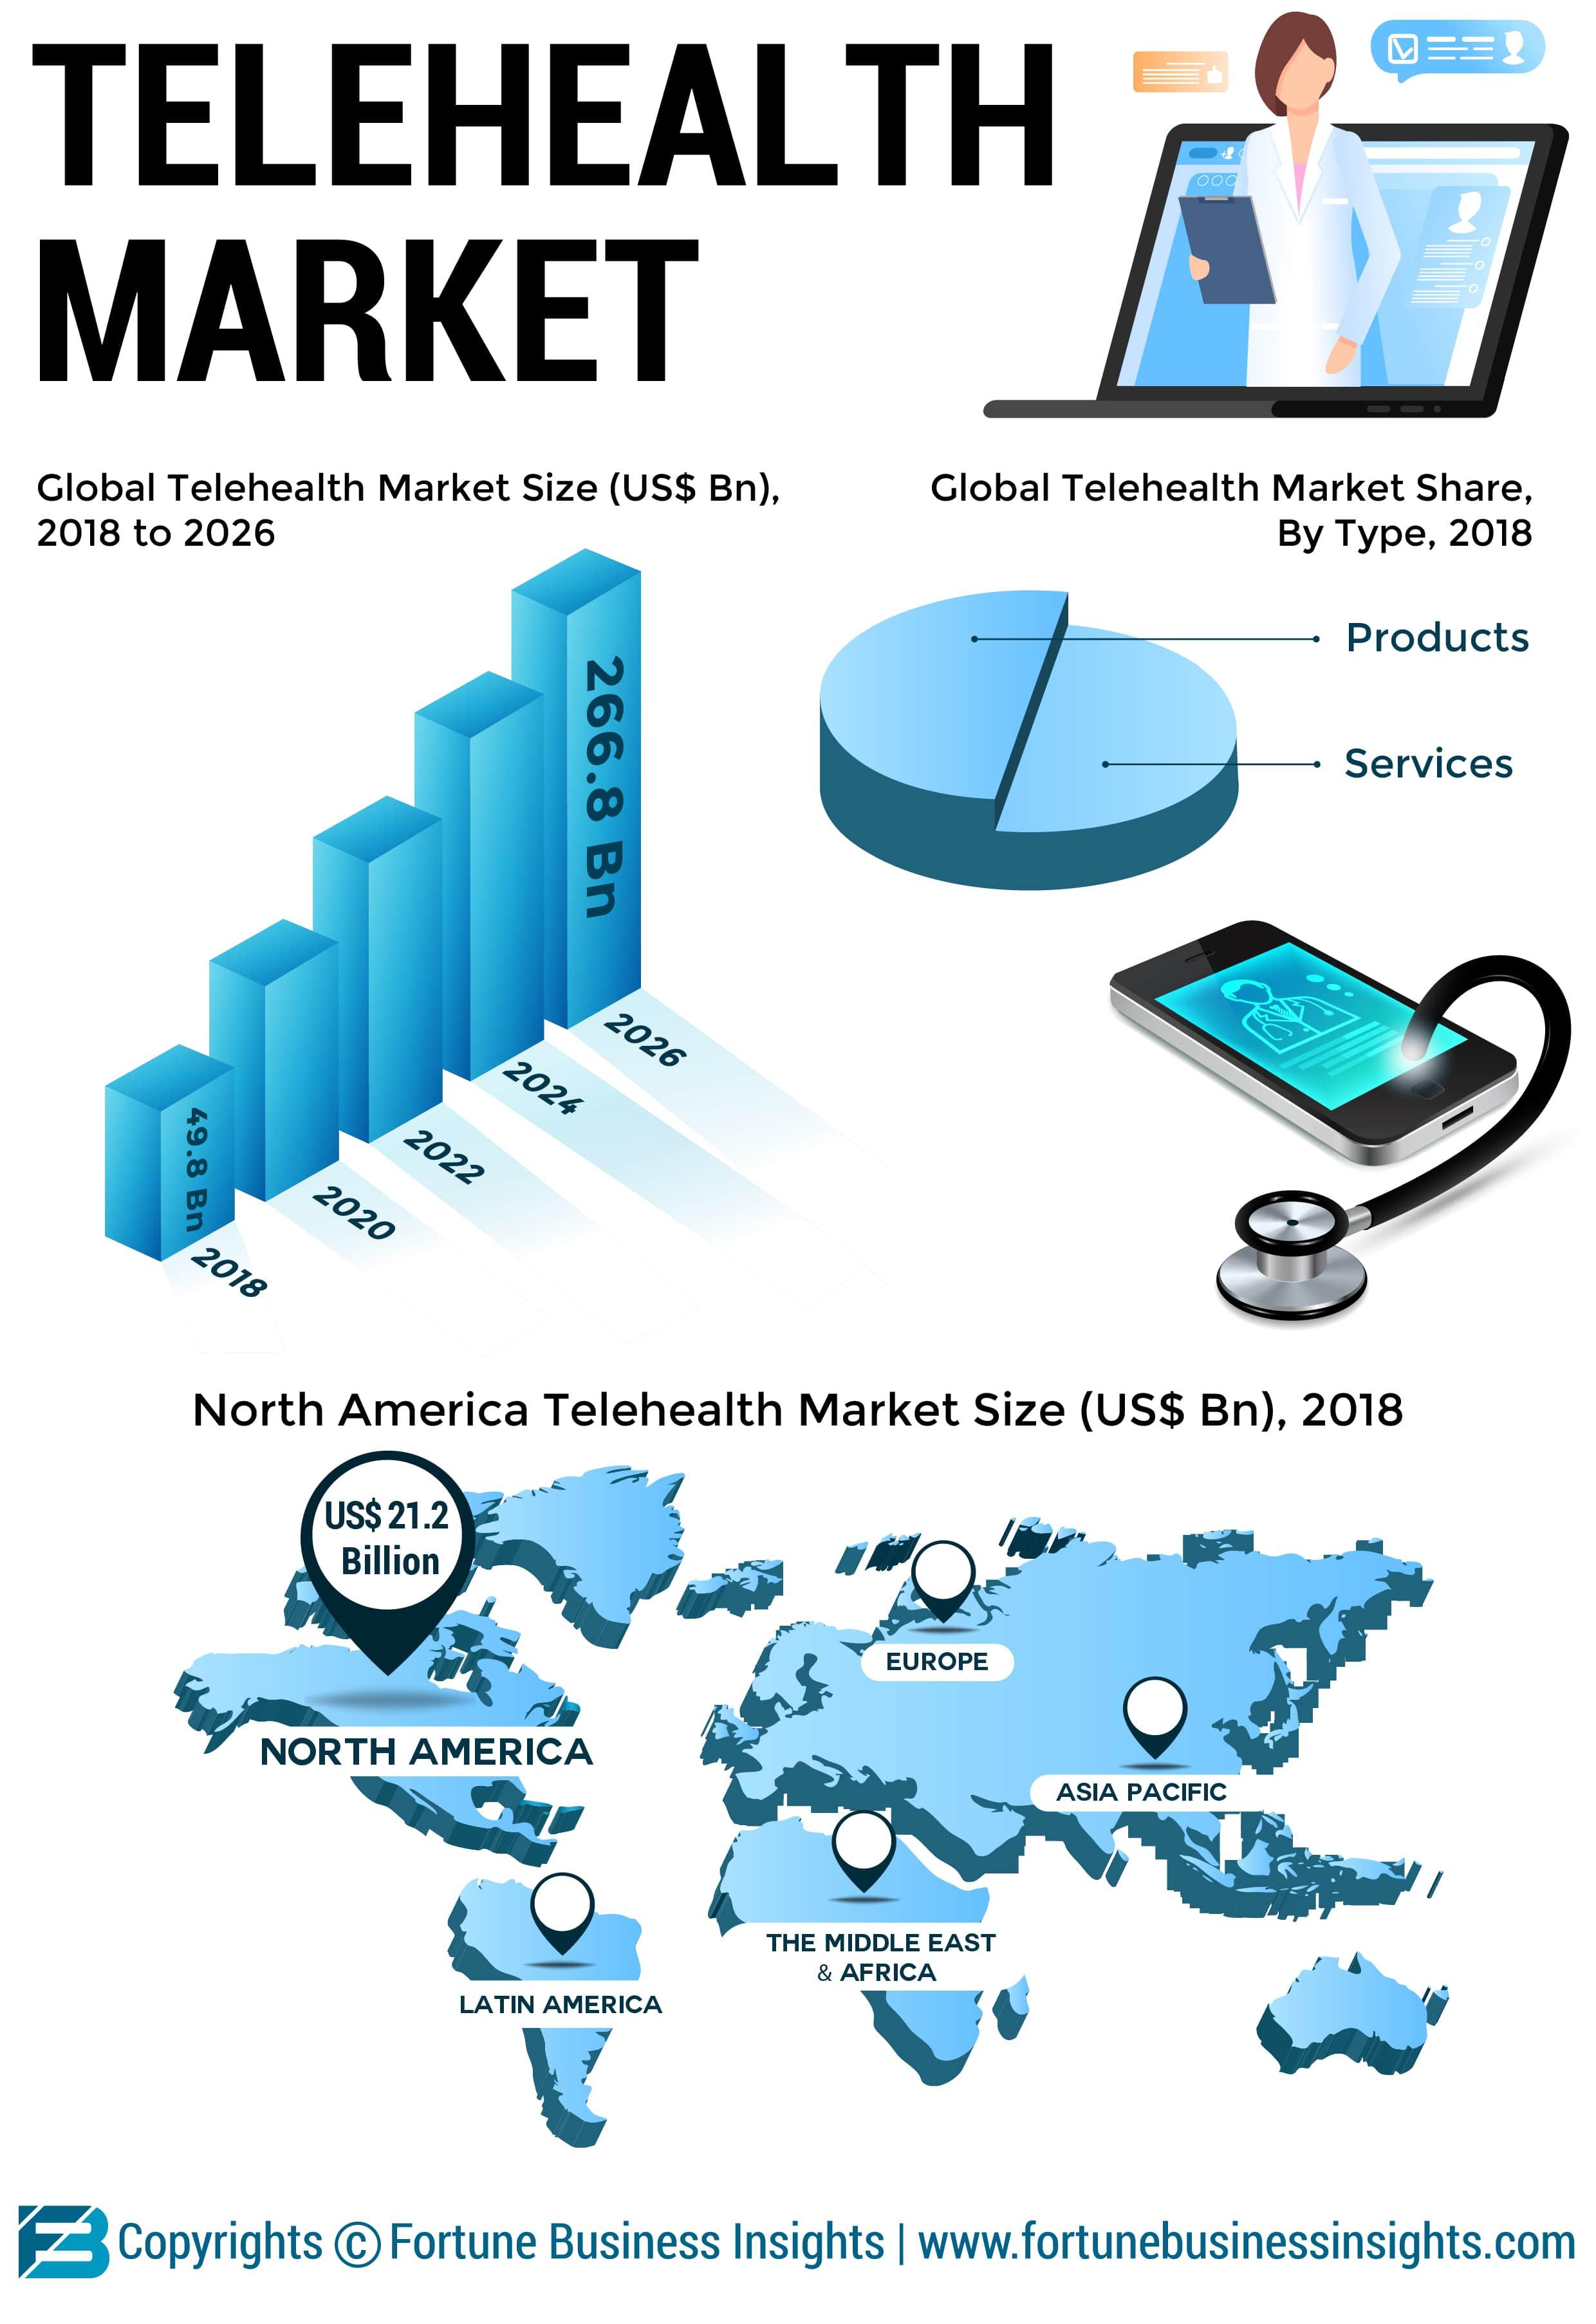 Telehealth Market